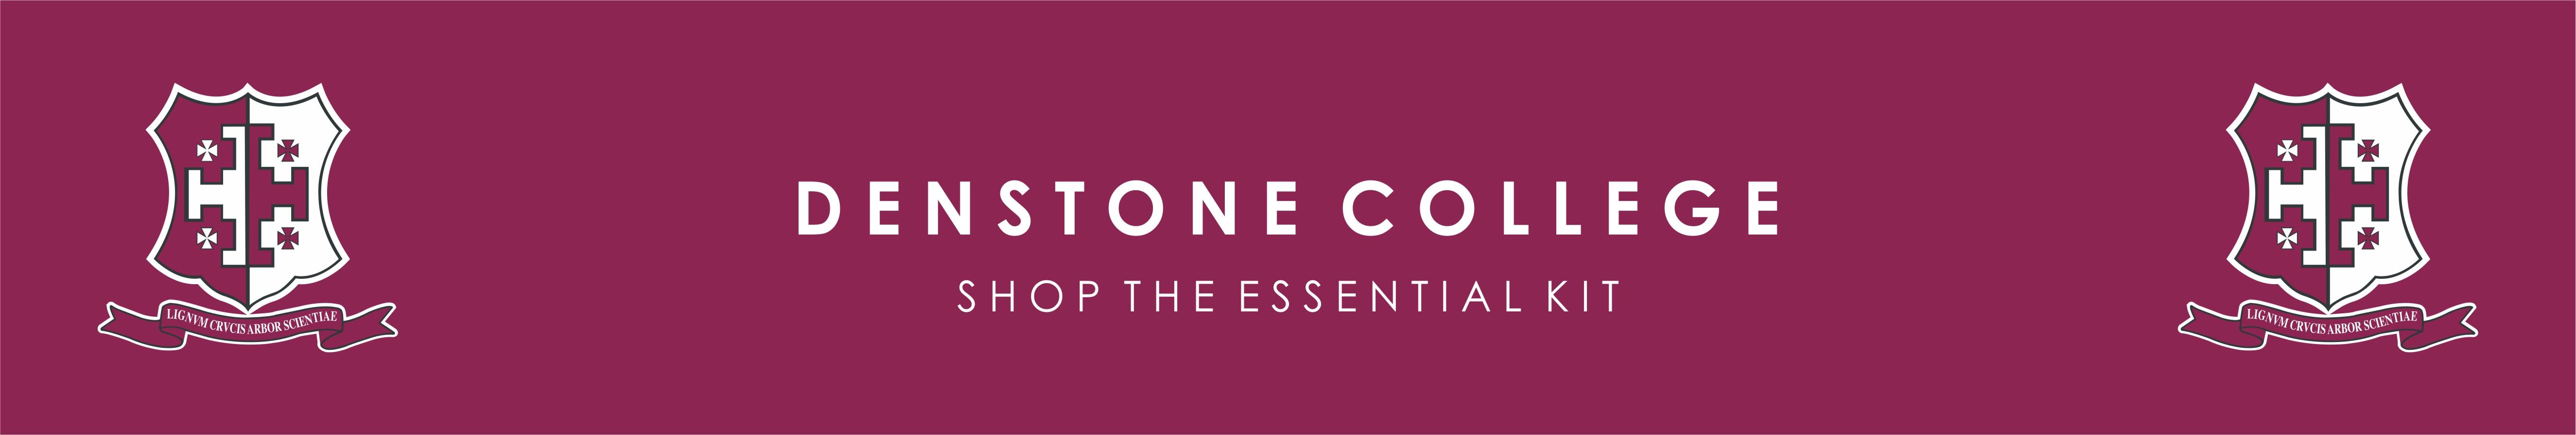 denstone-college-web-banner-edited-16819.jpg